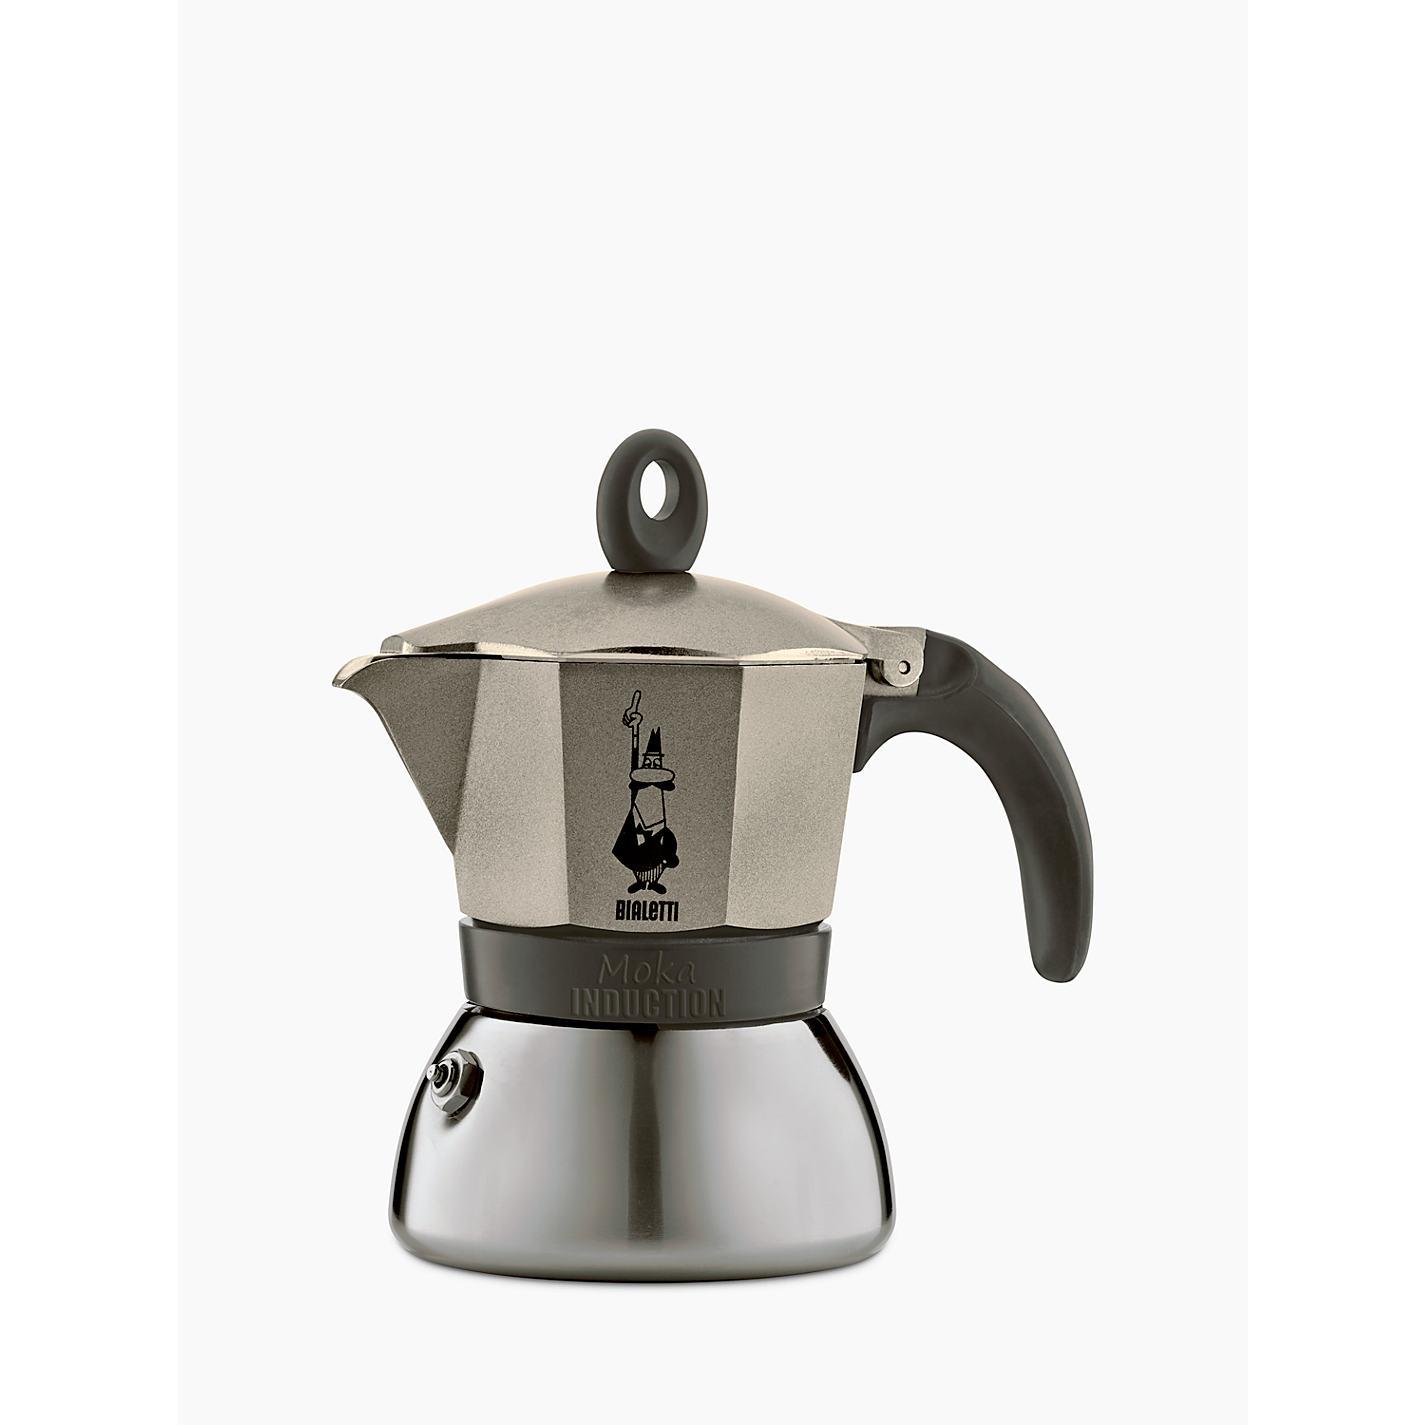 Bialetti Moka Induction Coffee Maker 6 Cup